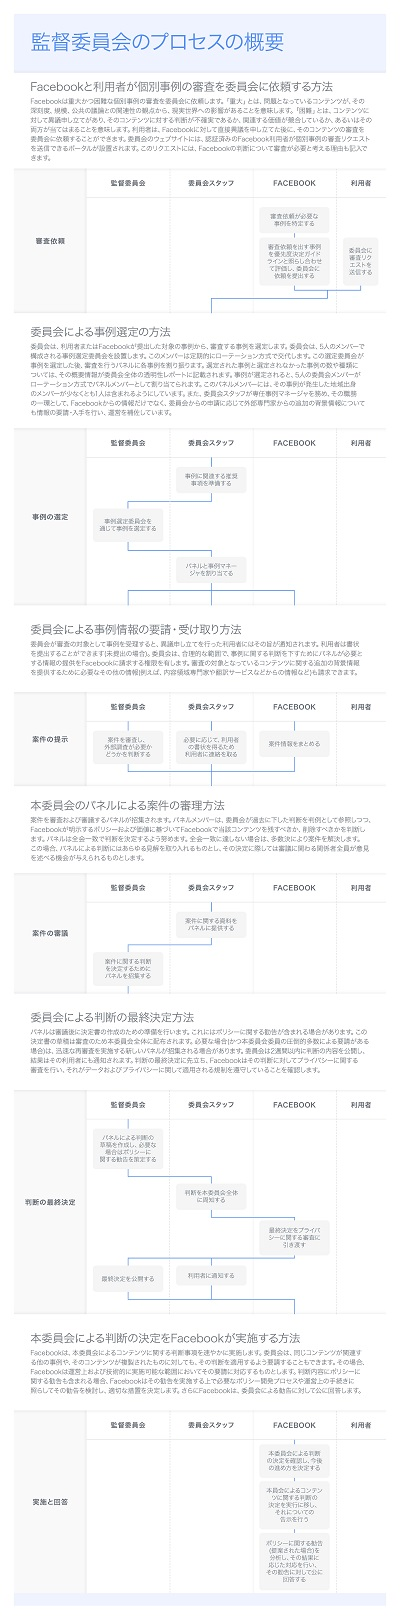 Process_Decision Flow_v8 copy_ONLINE_ja_JP